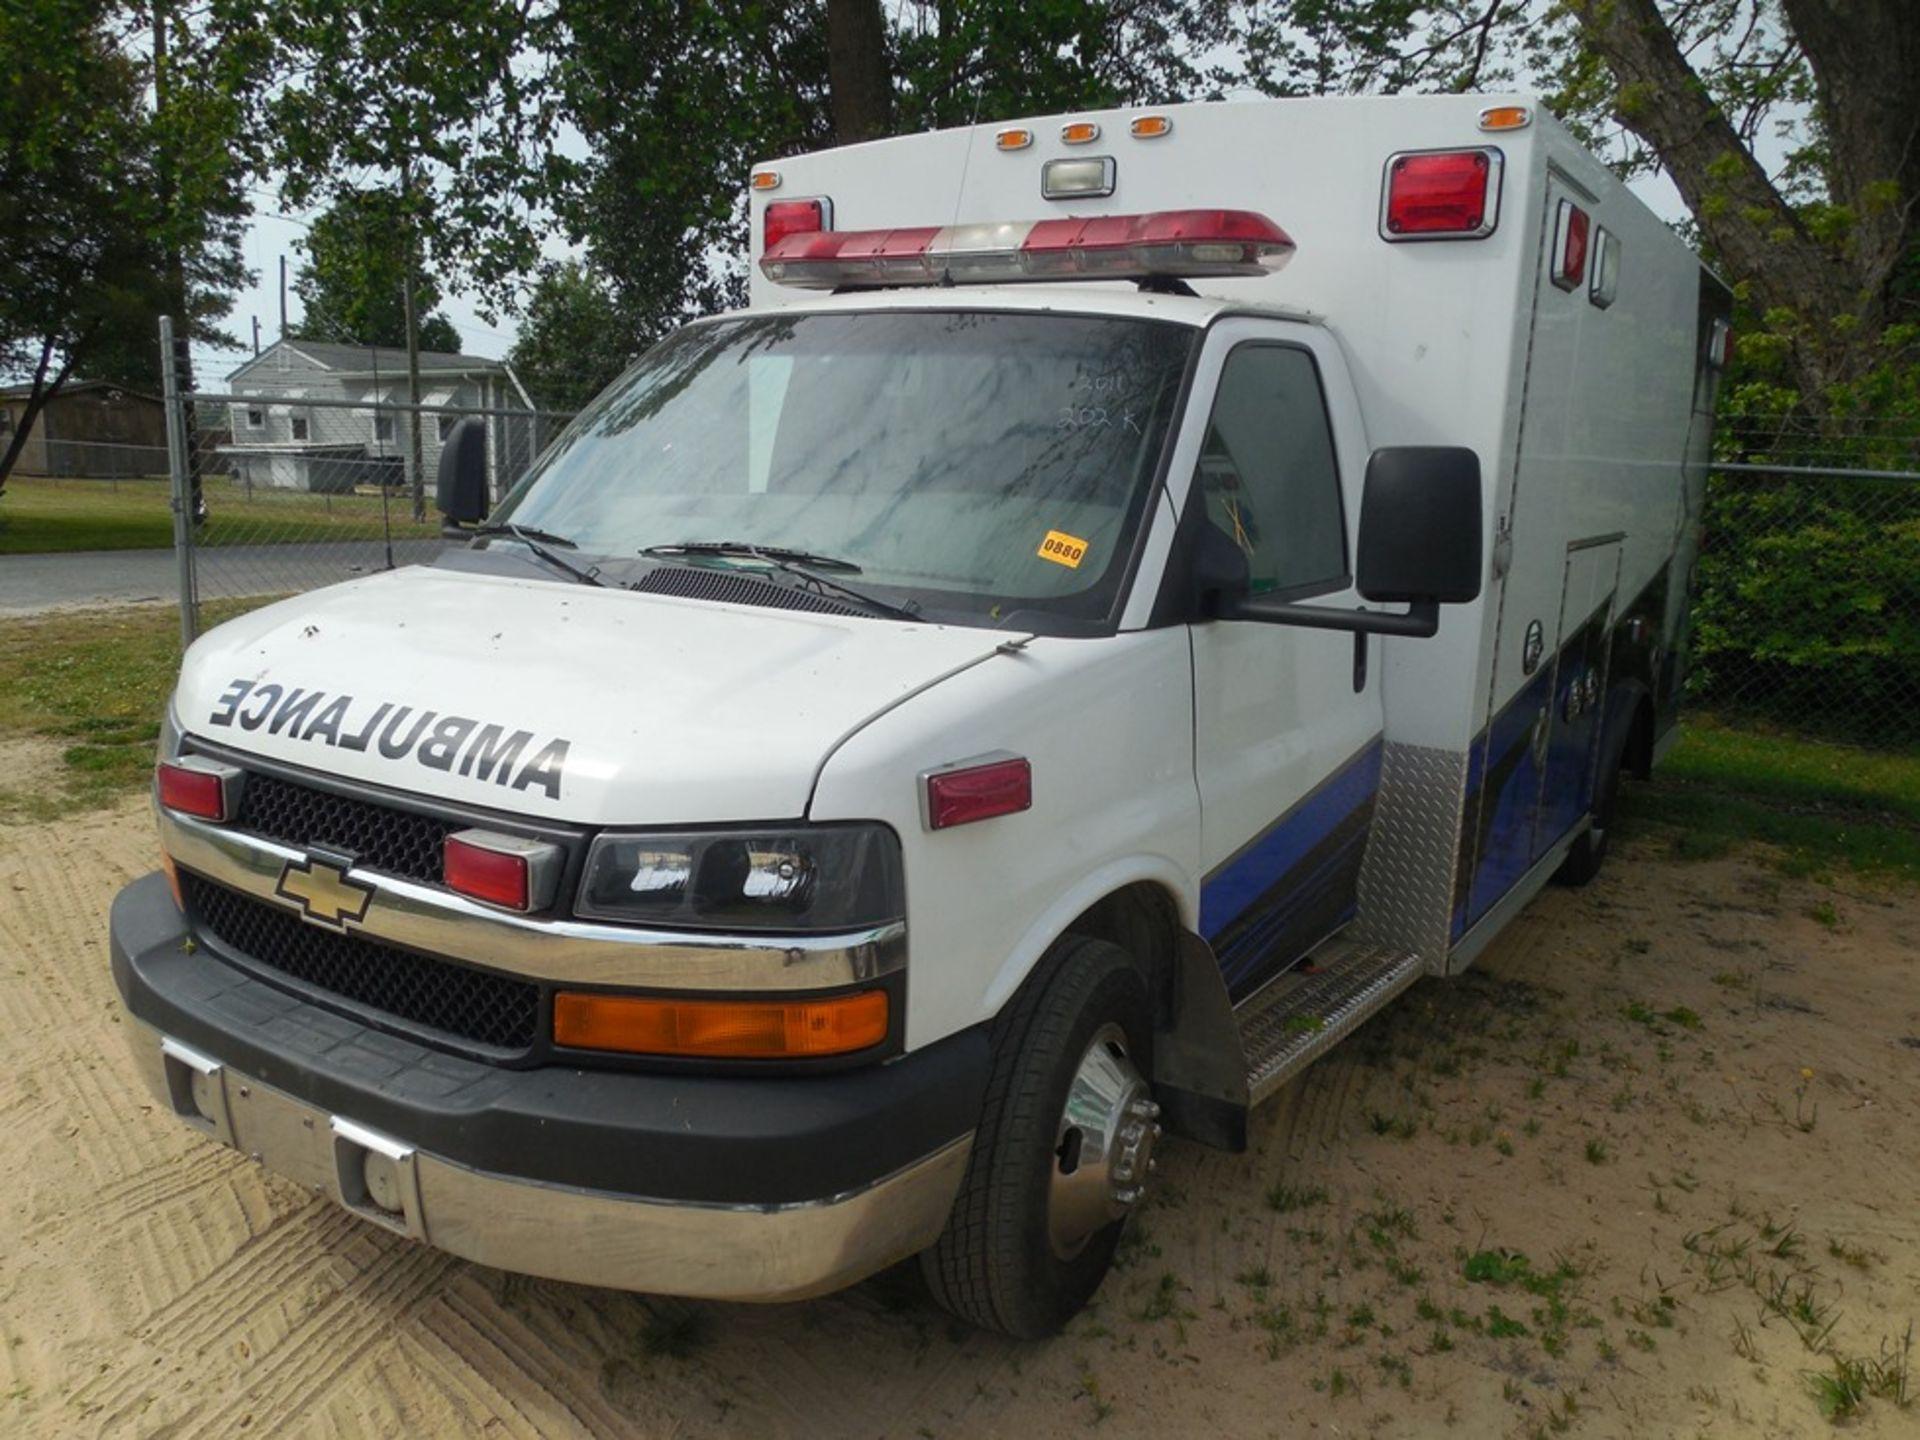 2011 Chev dsl. box ambulance Baun Body 202,680 miles vin# 1GB6G5CL5B1141656 - Image 2 of 6